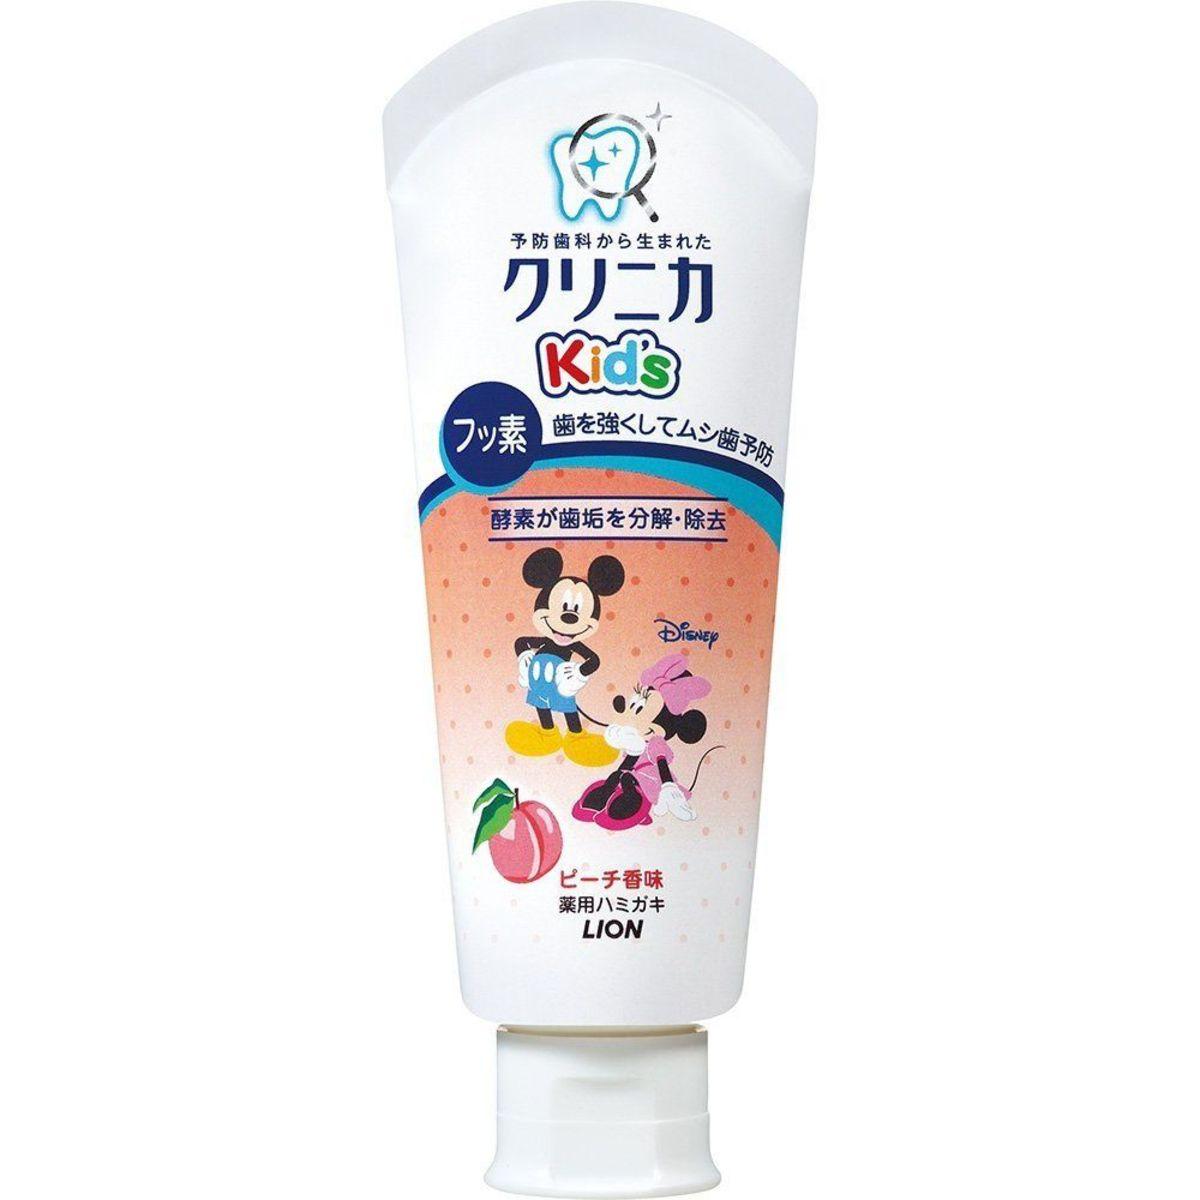 Mickey Kid's 學齡款兒童牙膏 (6-12歲適用) 60g  桃味